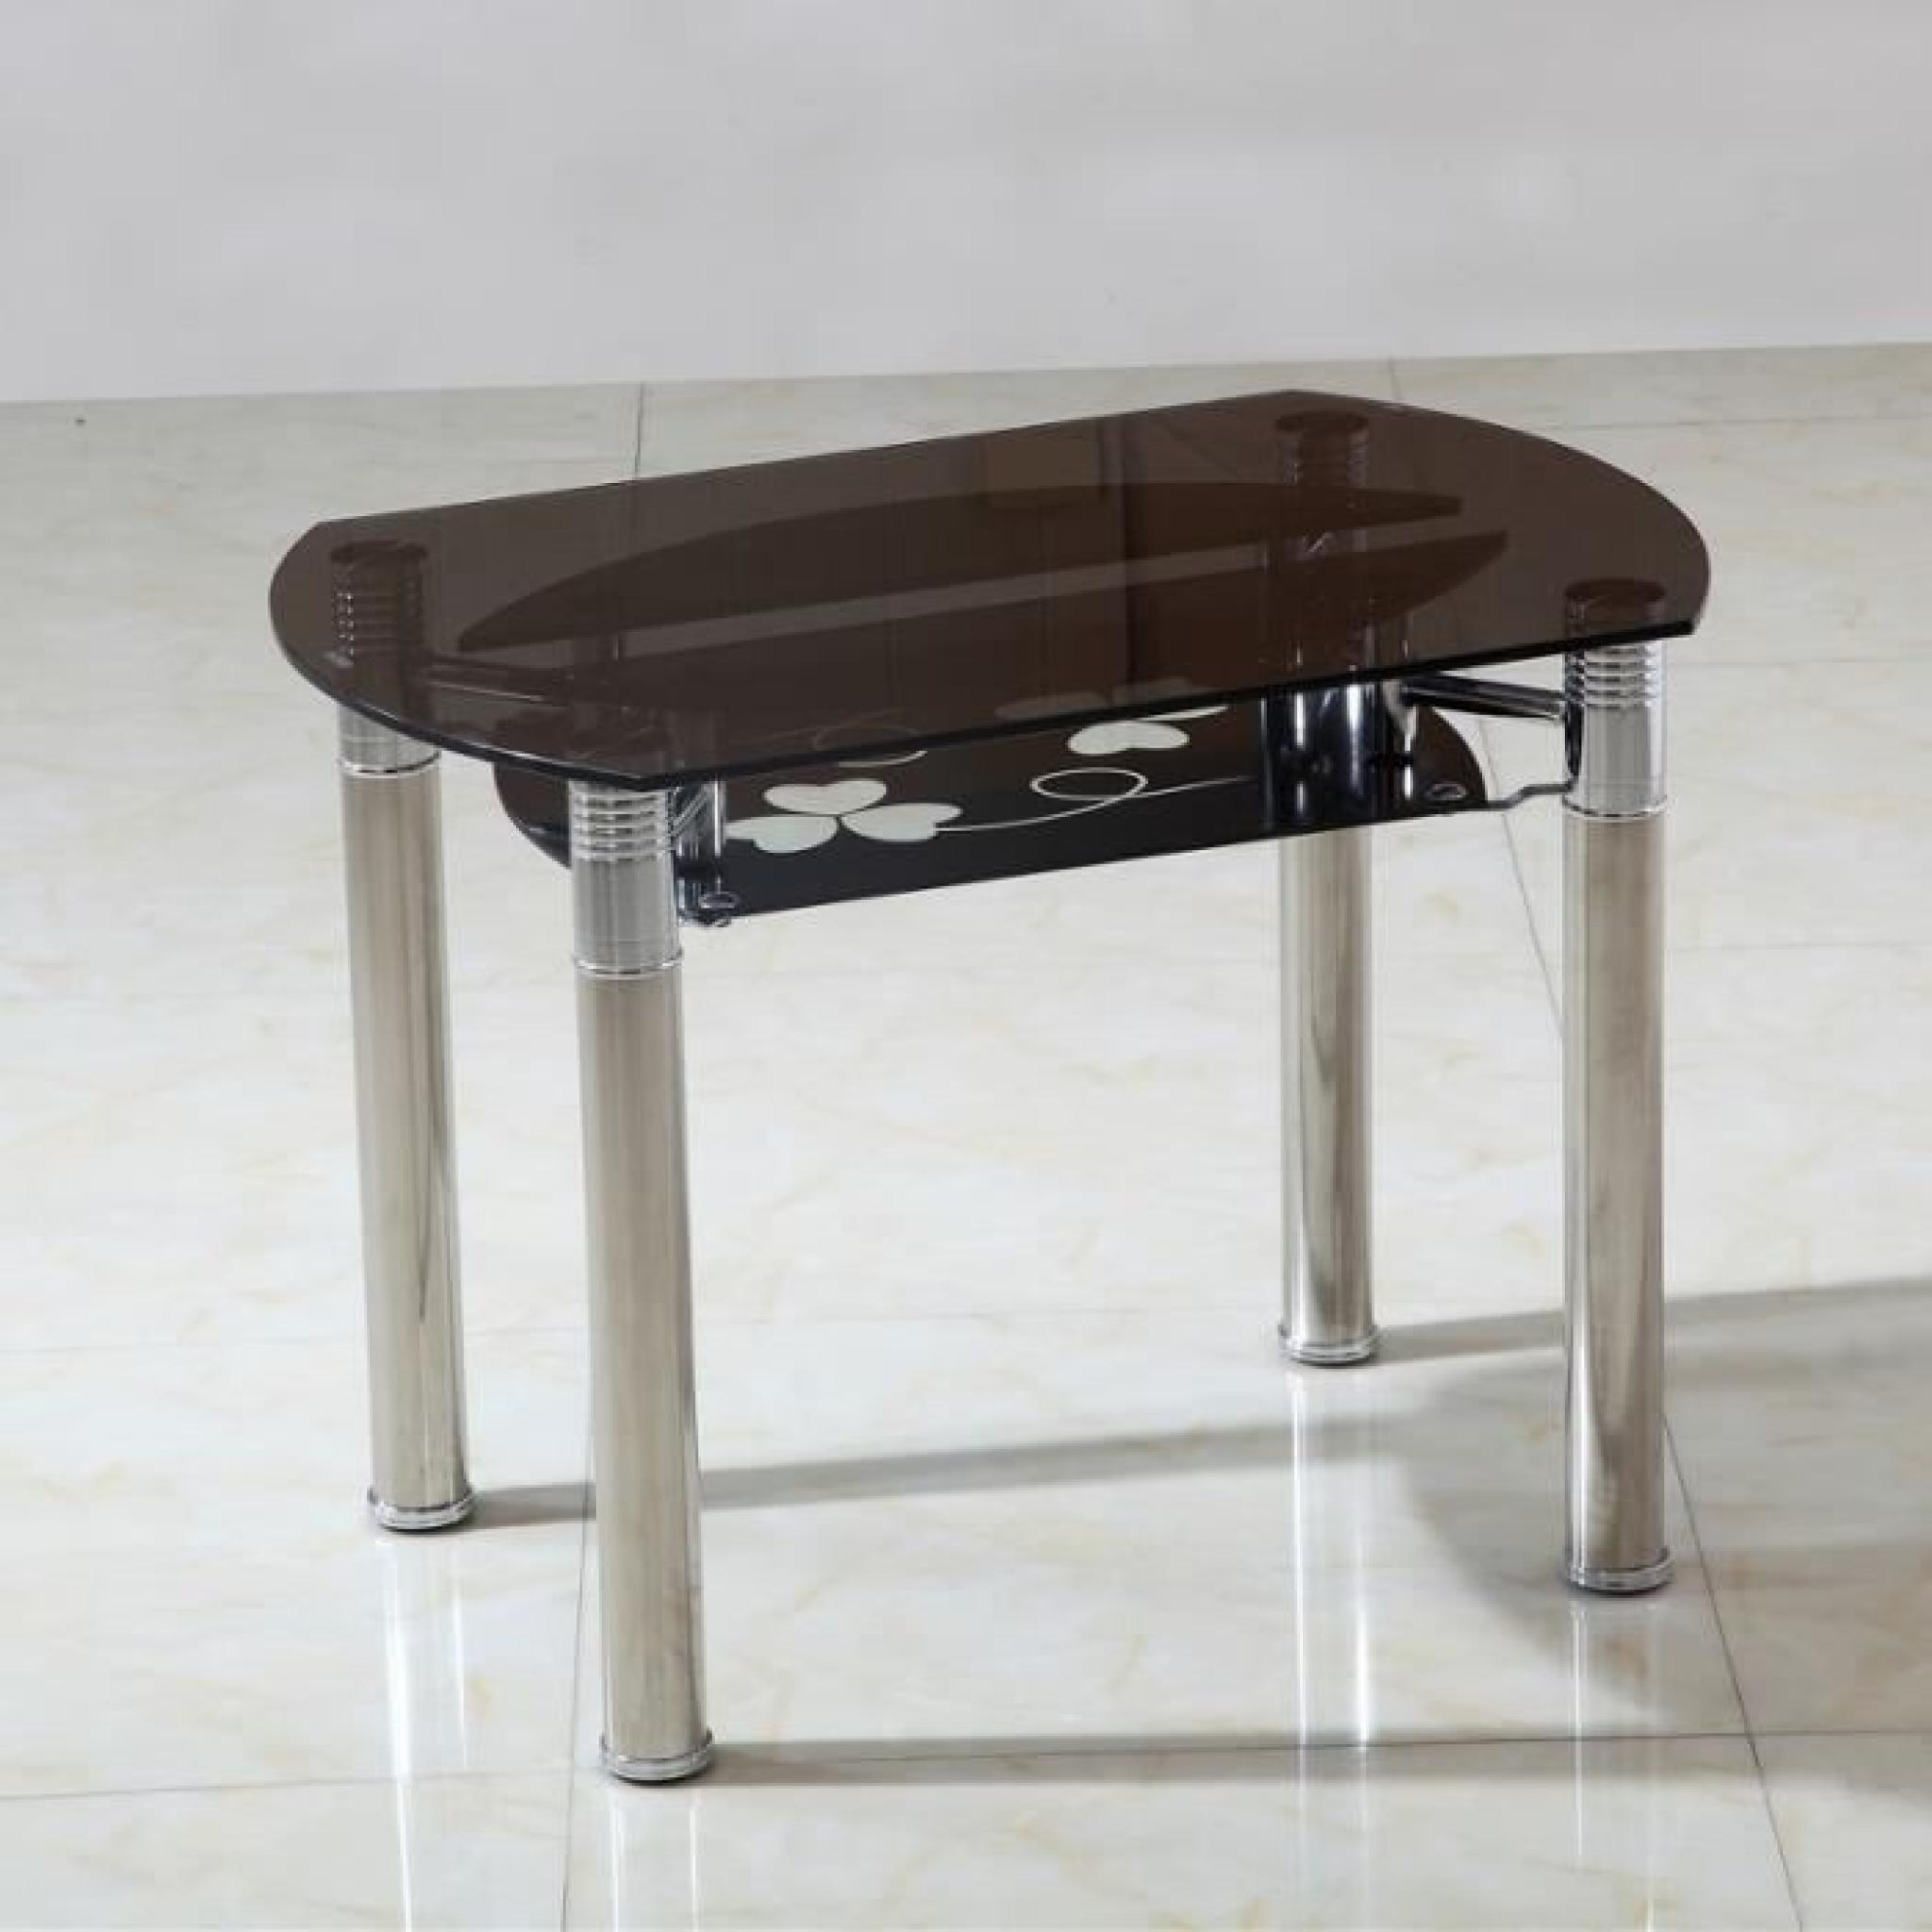 Table ronde extensible en verre fumé Tinos Ø 130 cm - Achat/Vente ...